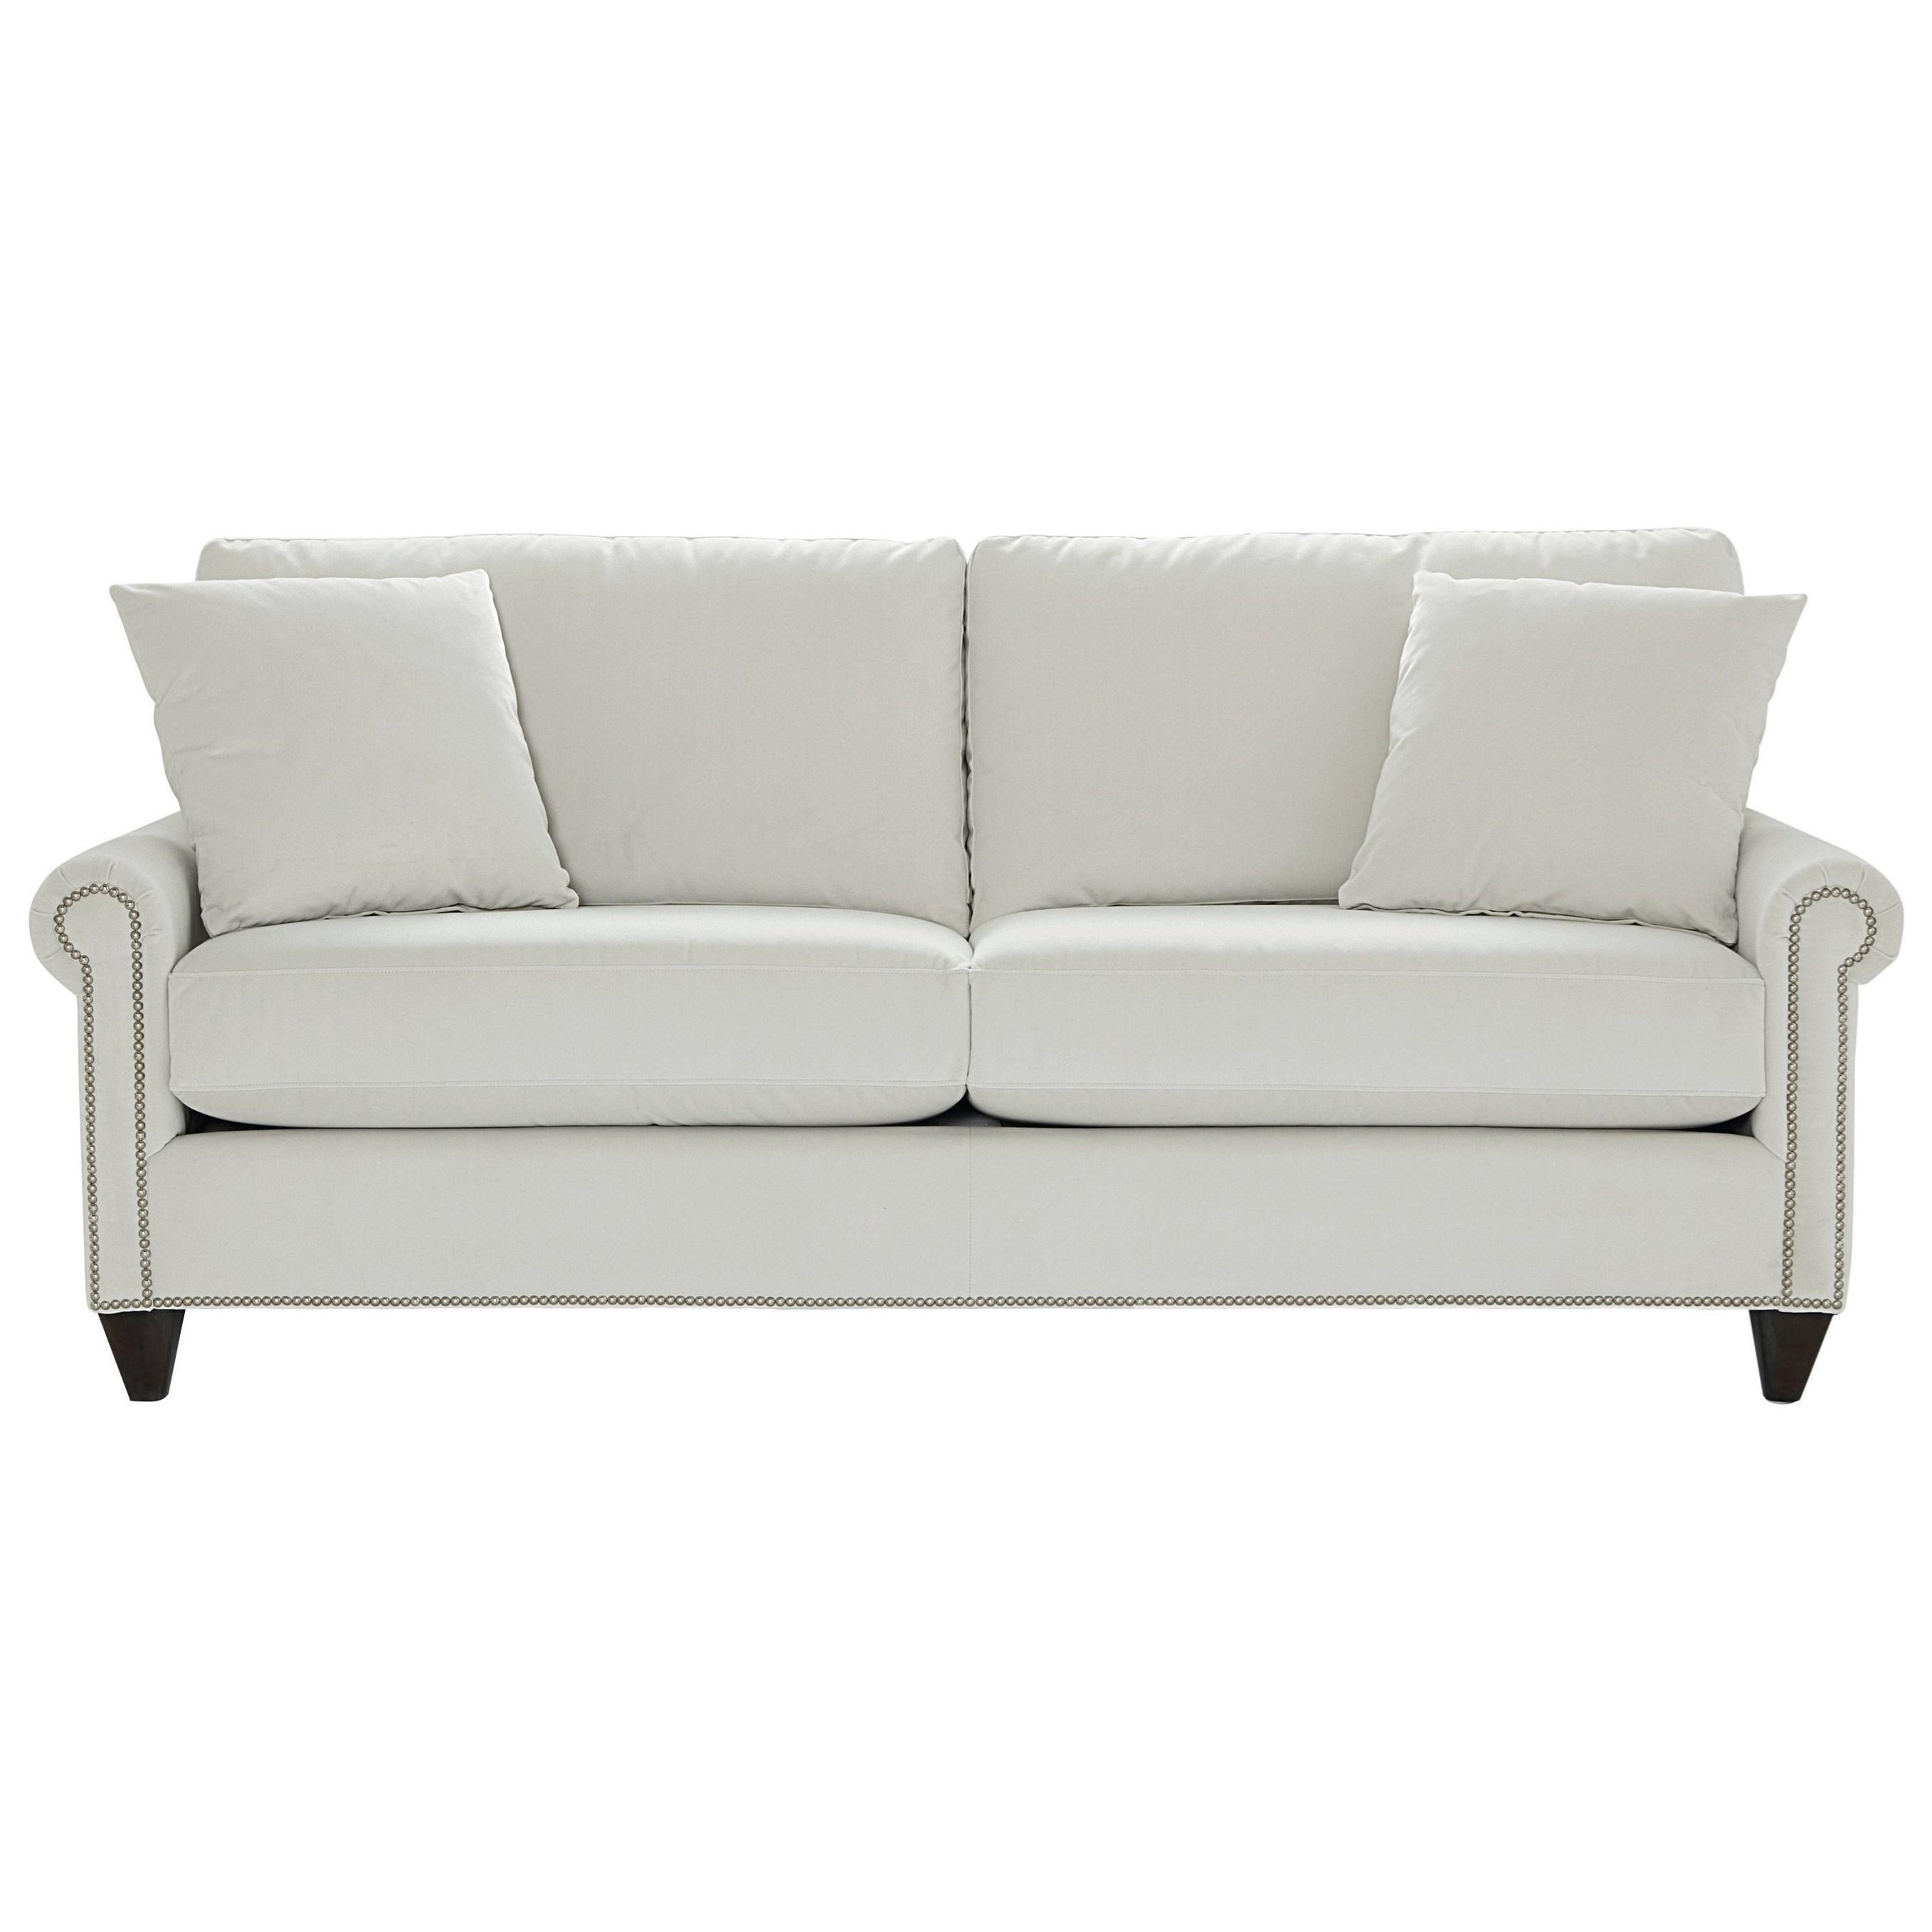 Customizable Classic Sofa